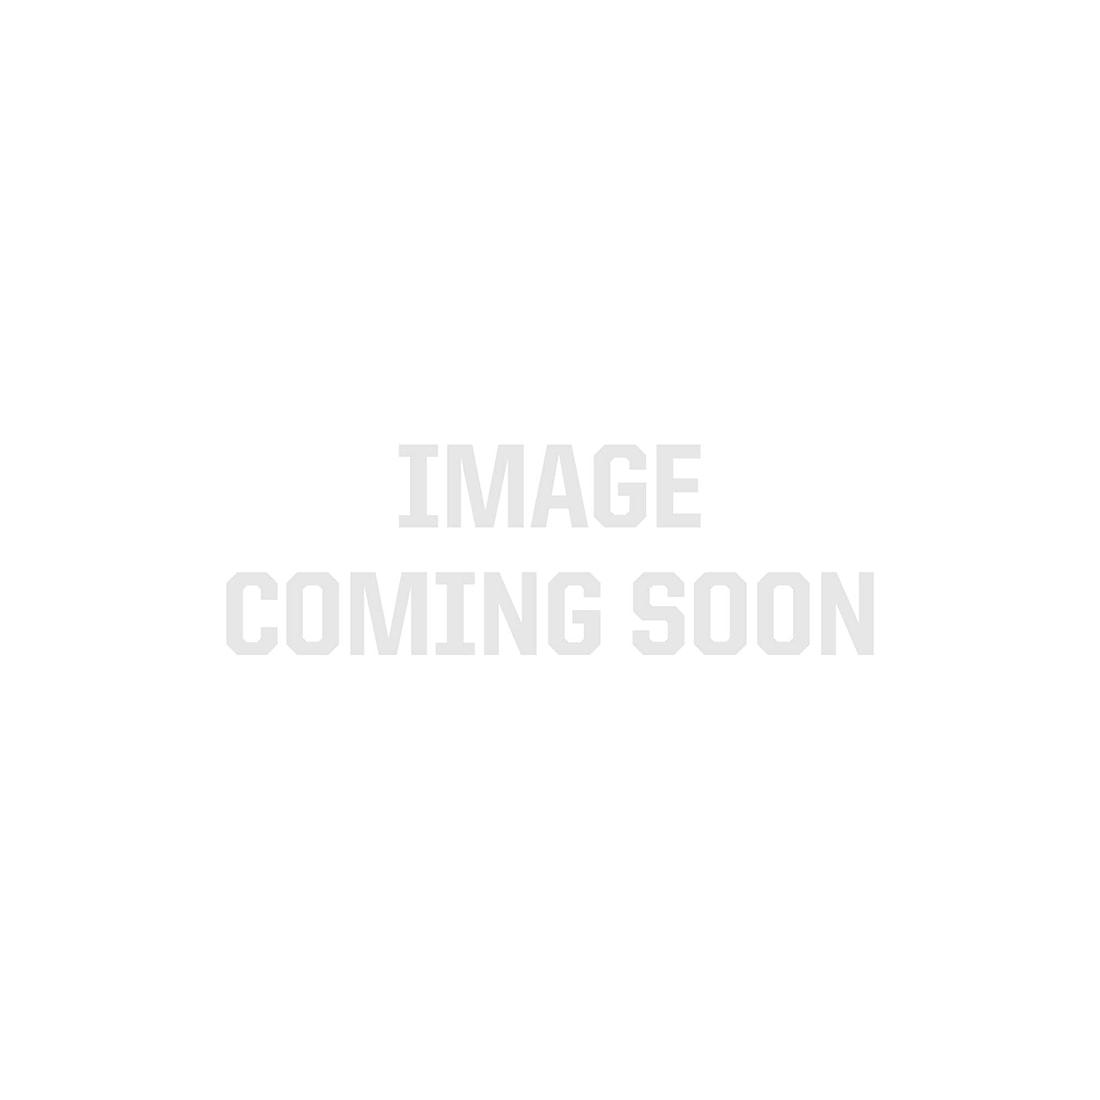 TruColor 2835 CurrentControl LED Strip Light - 2,700K - 160/m - CurrentControl - Sample Kit